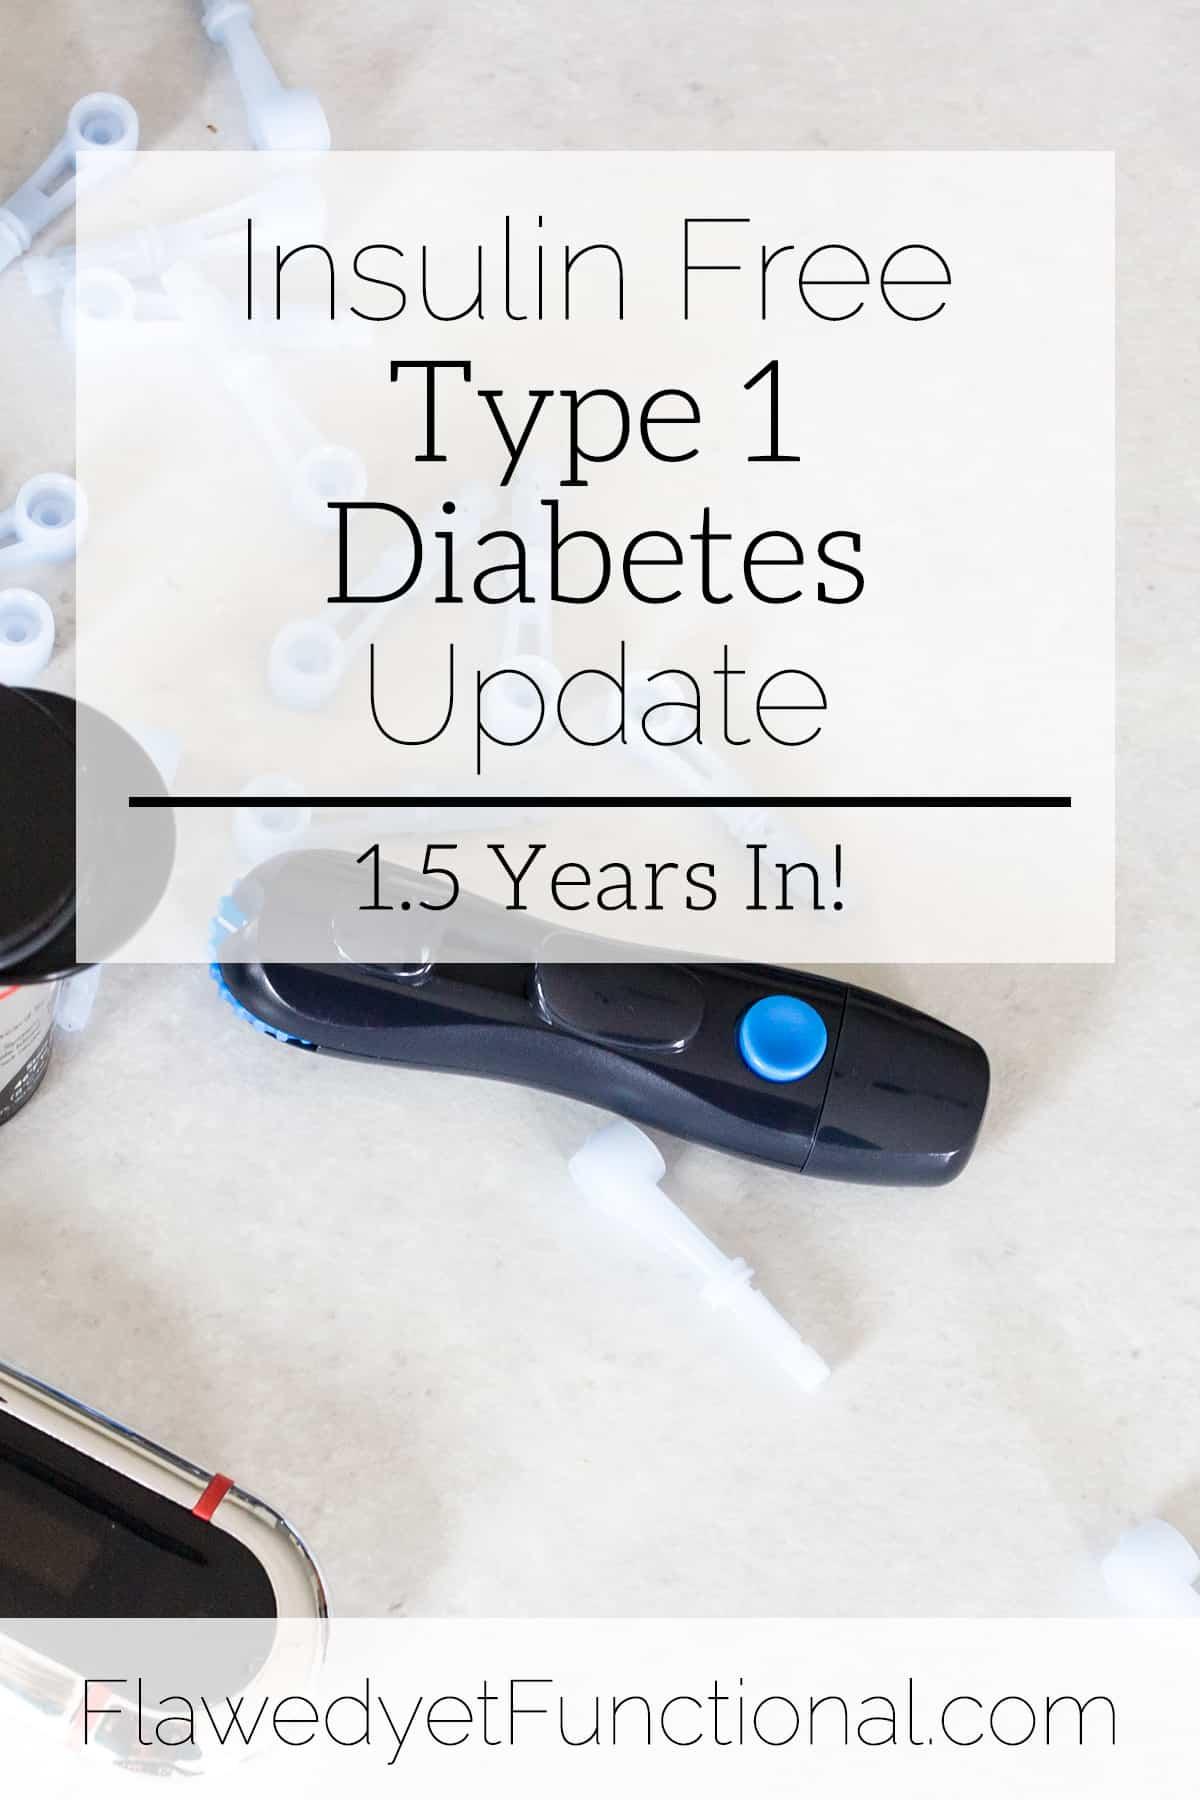 Insulin Free Type 1 Diabetes Update | September 2018